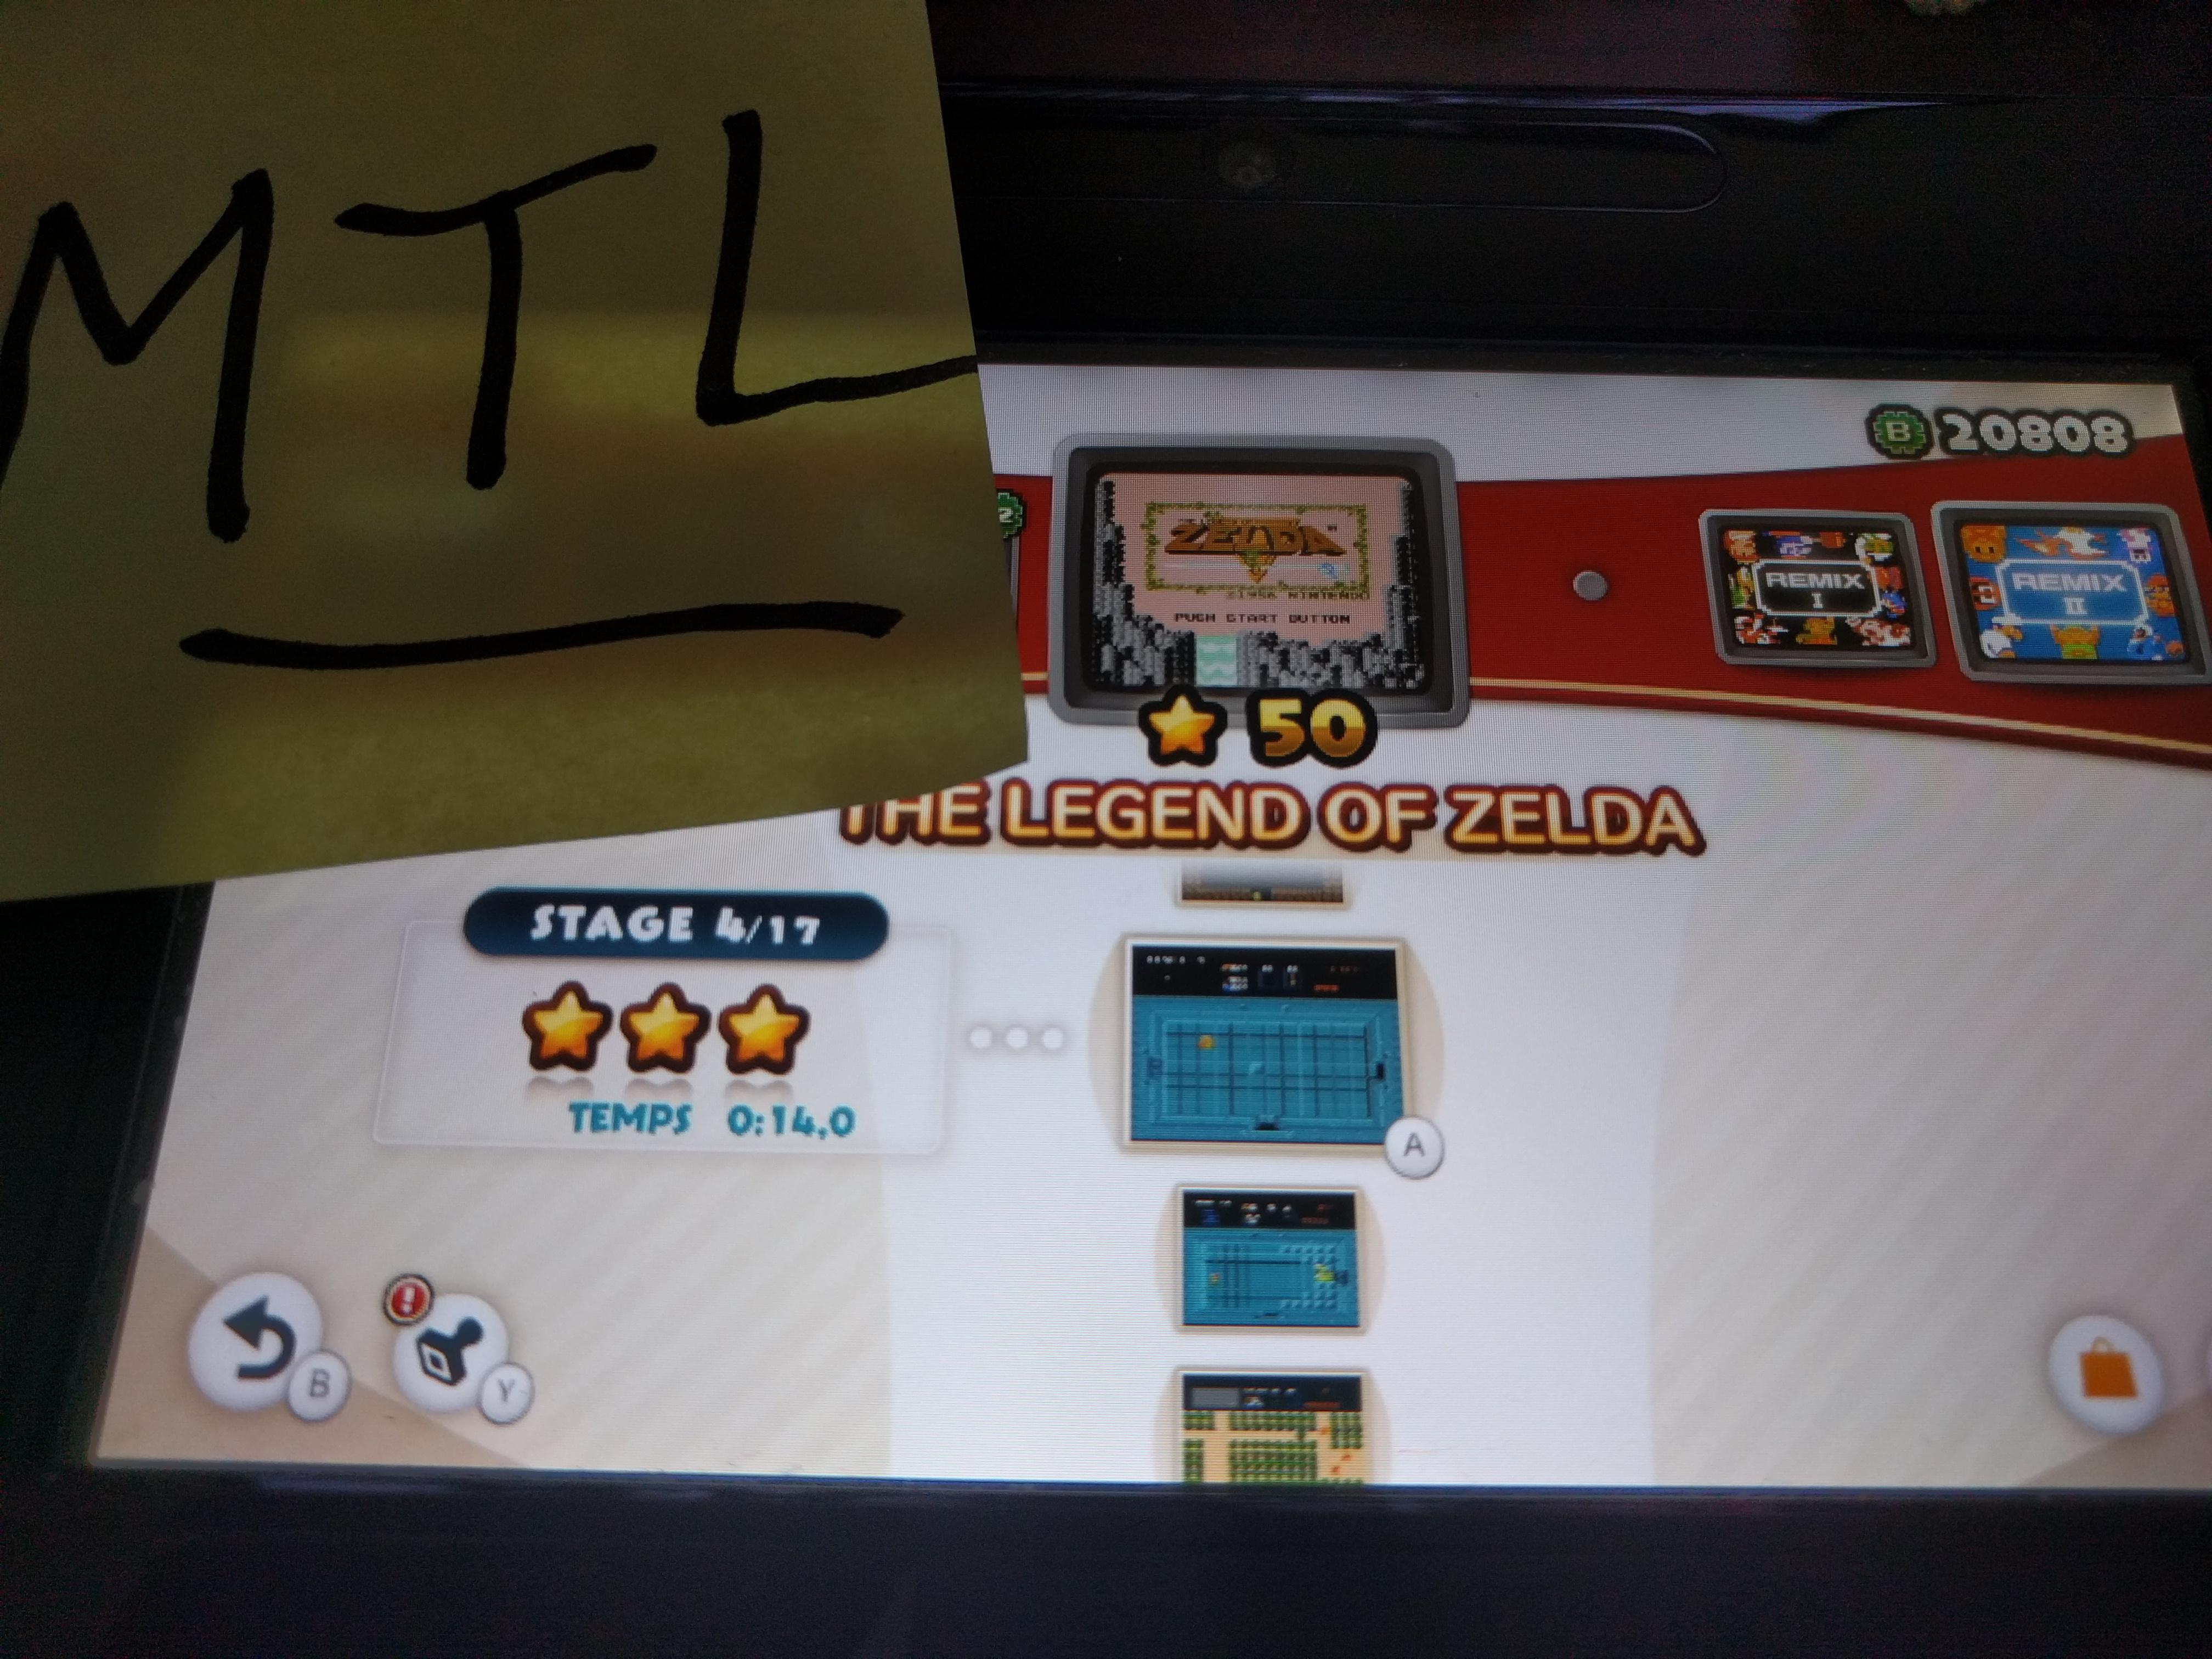 Mantalow: NES Remix: The Legend of Zelda: Stage 4 (Wii U) 0:00:14 points on 2016-06-11 03:03:25